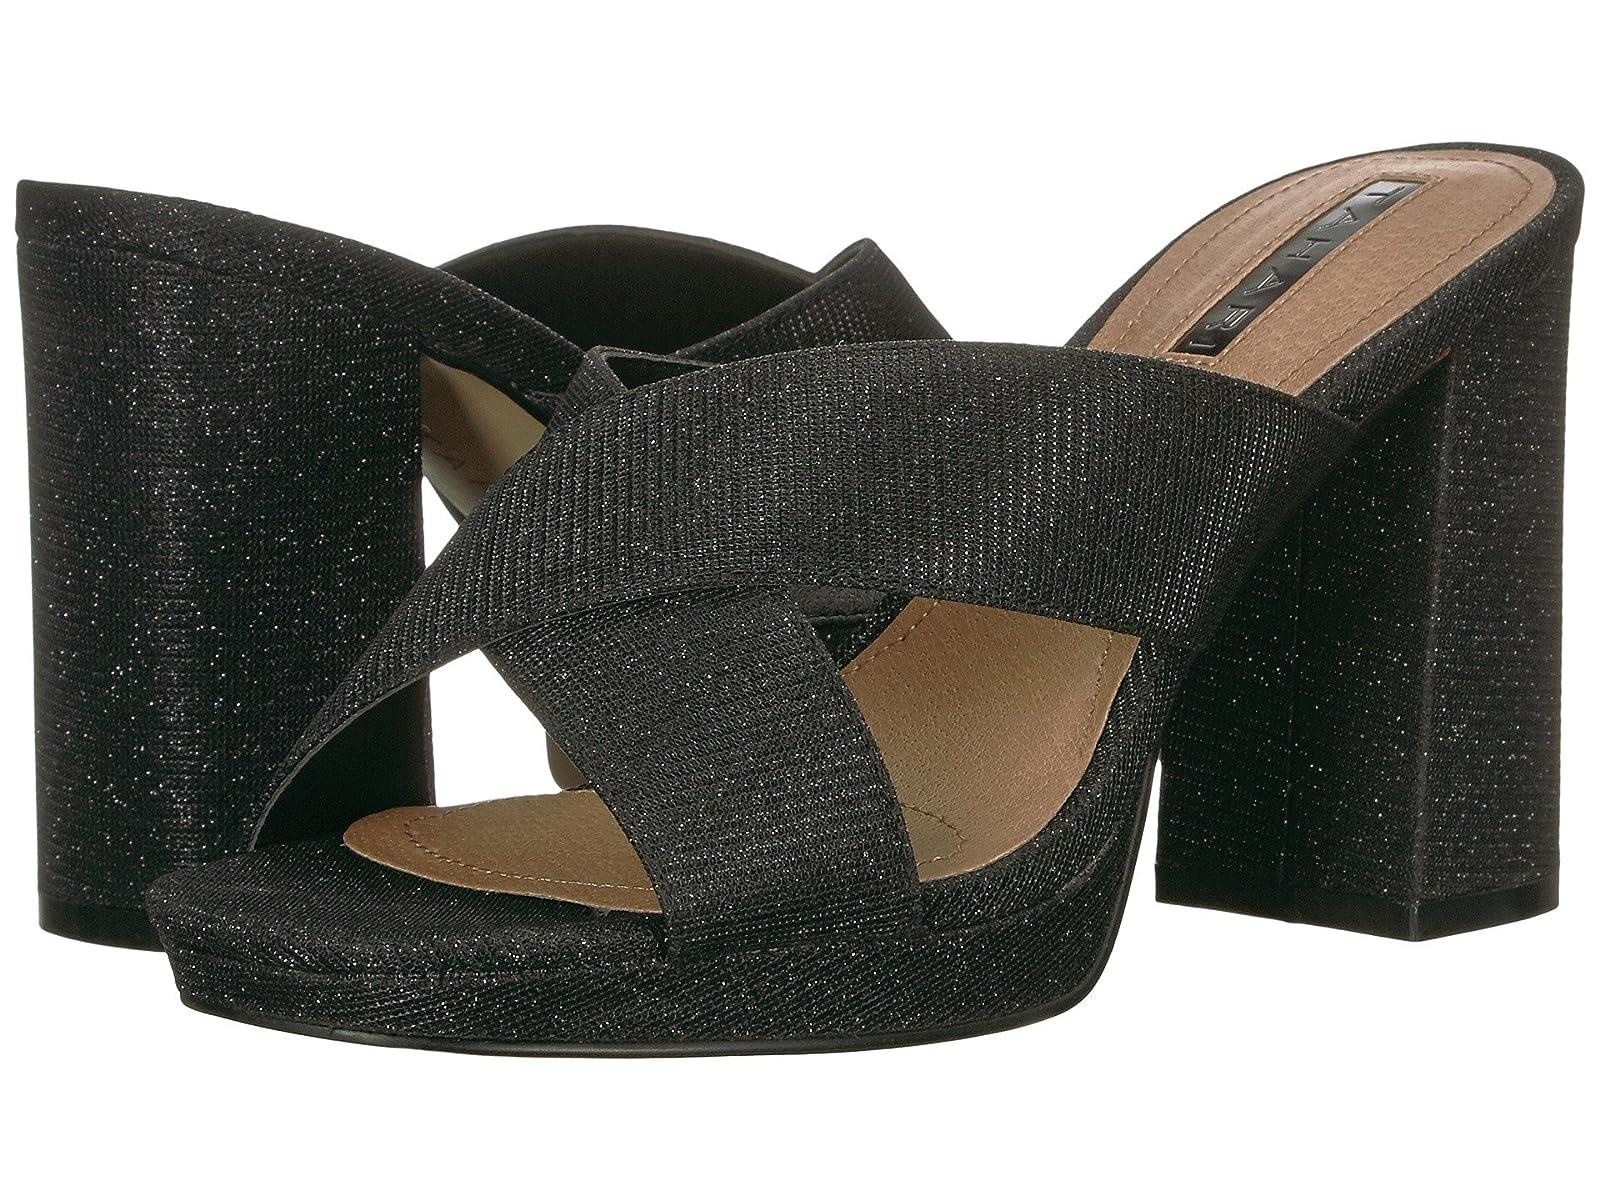 Tahari PoseyCheap and distinctive eye-catching shoes